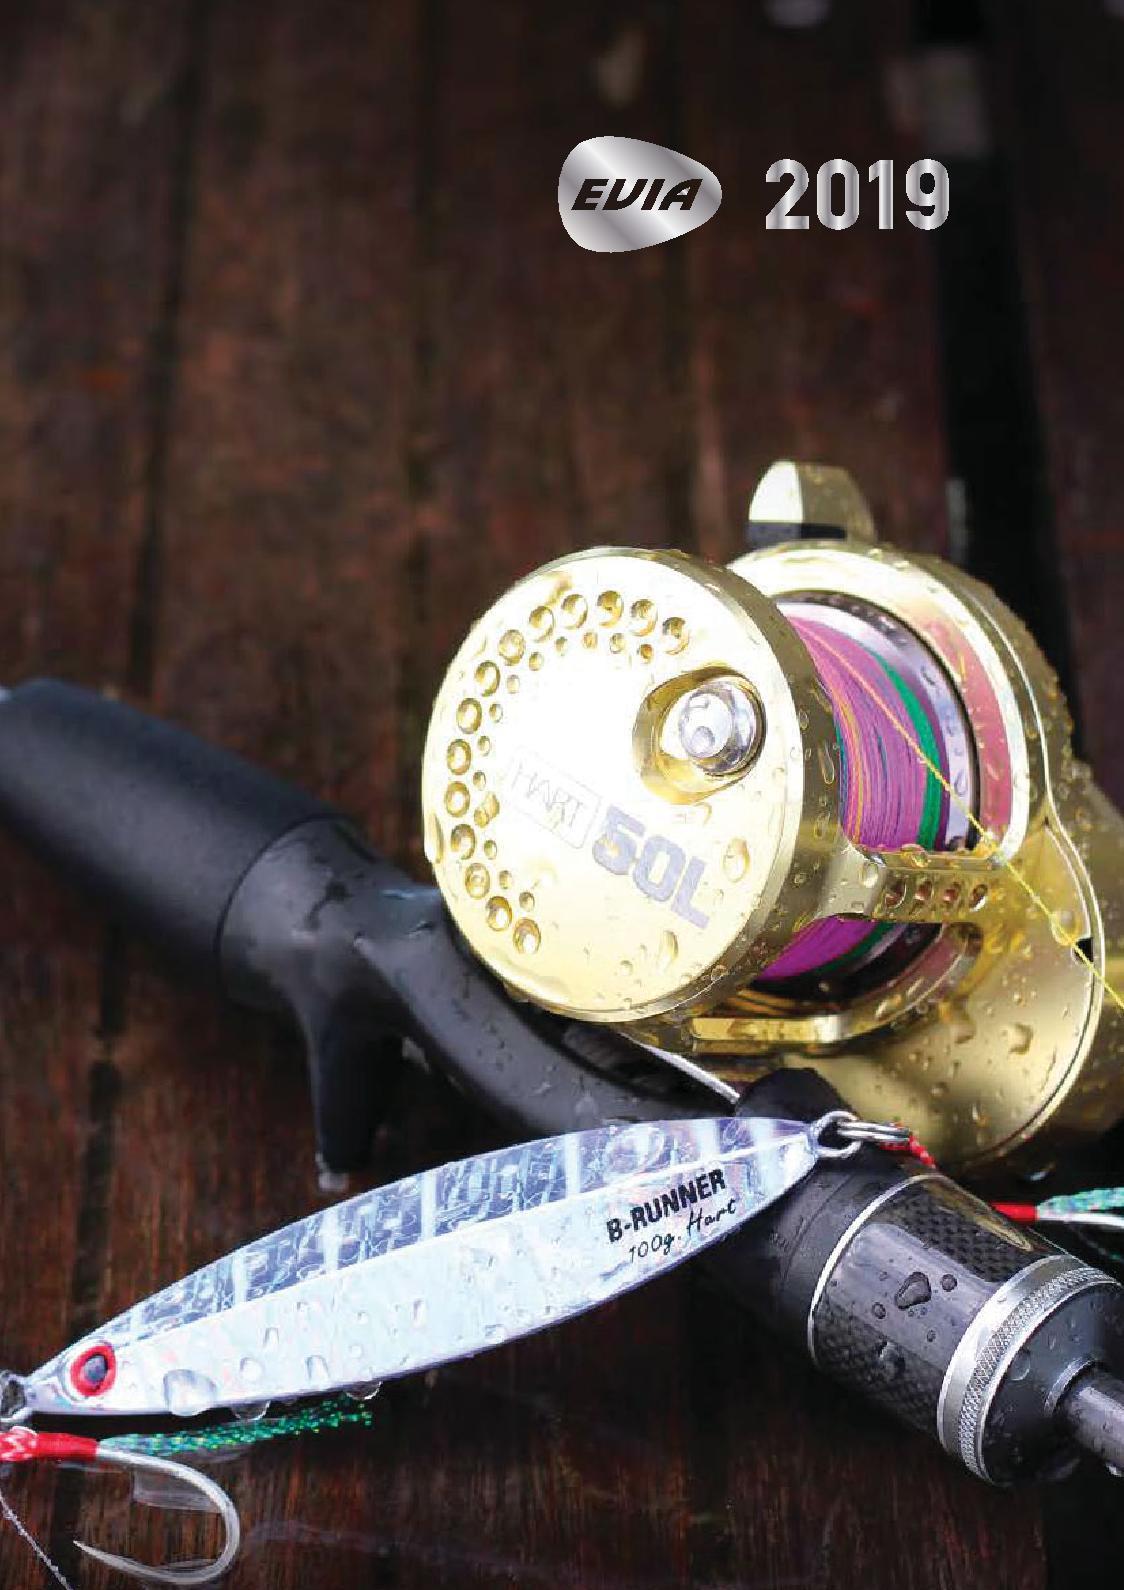 50pcs Angeln Rolling Swivels mit Ring Karpfen rigs Eis Angeln Swivel Stecker Gut